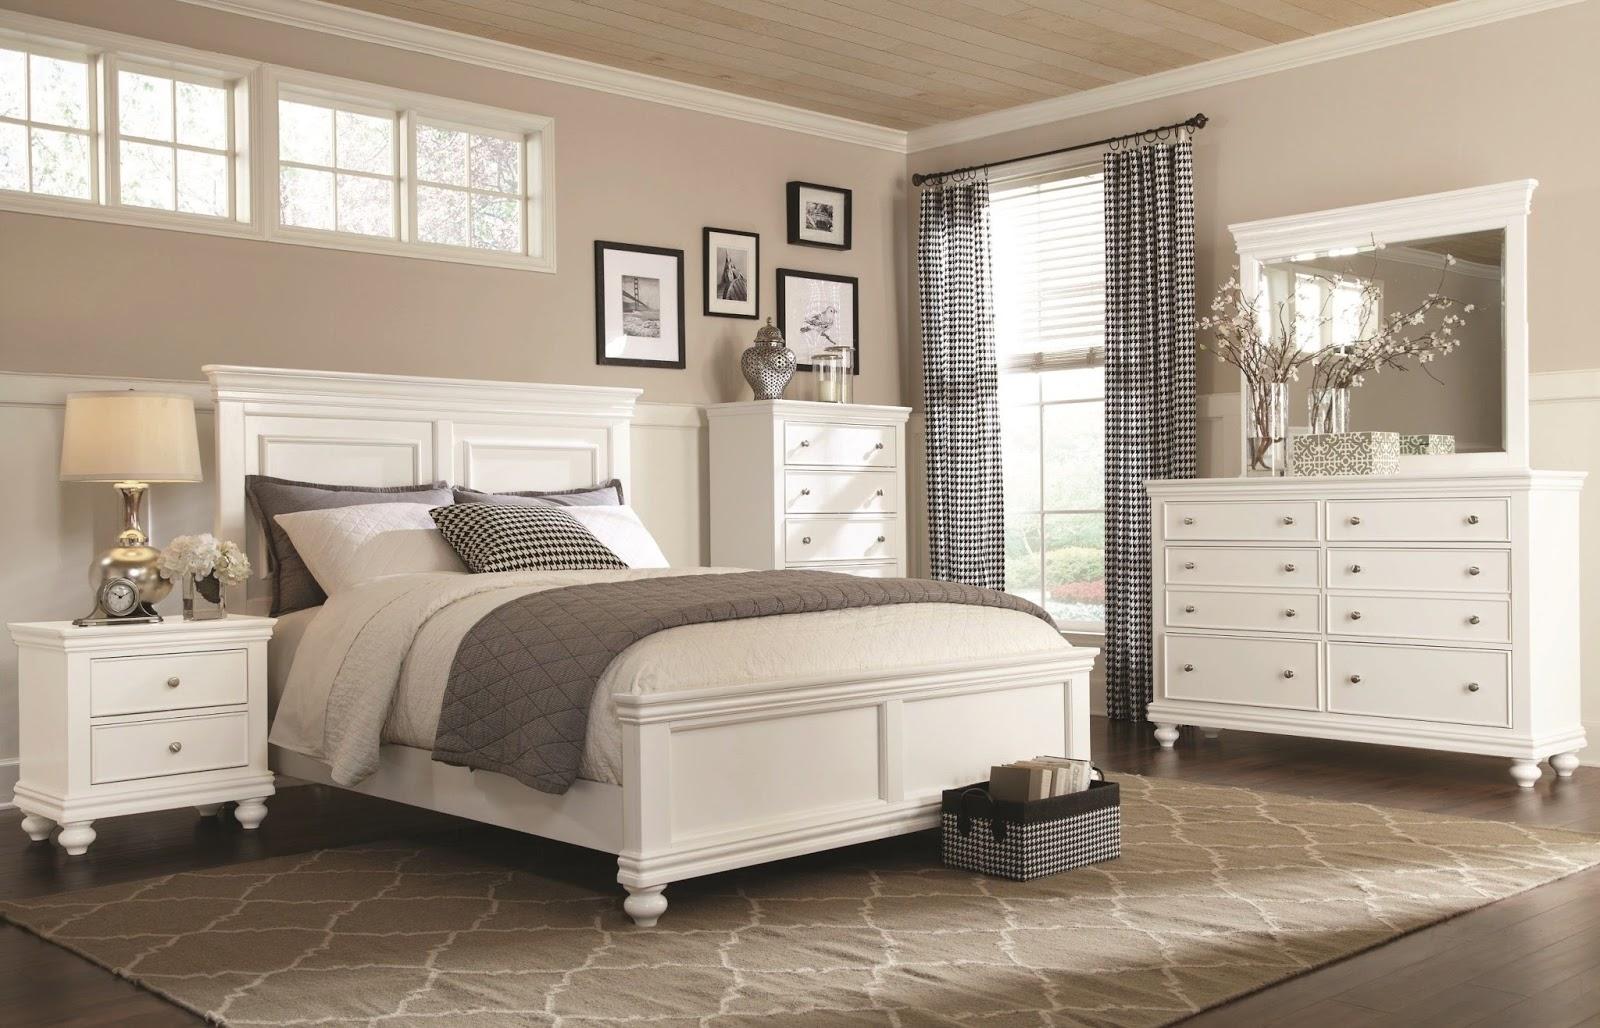 Portofolio White Bedroom Furniture For Adults You Will Love Ruangotun